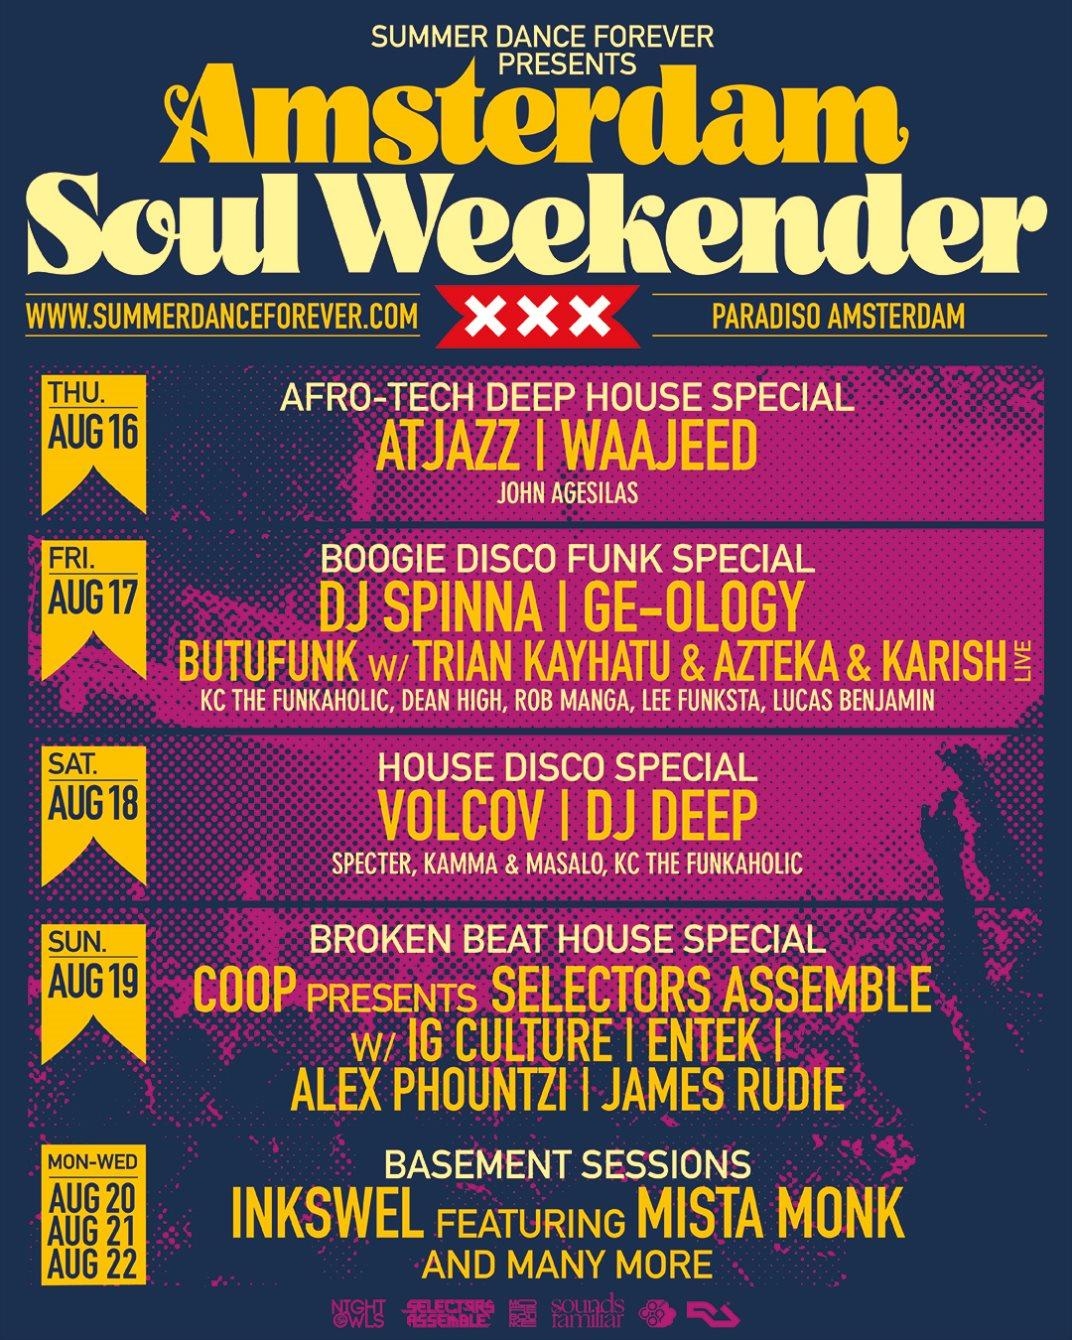 Amsterdam Soul Weekender - Flyer front